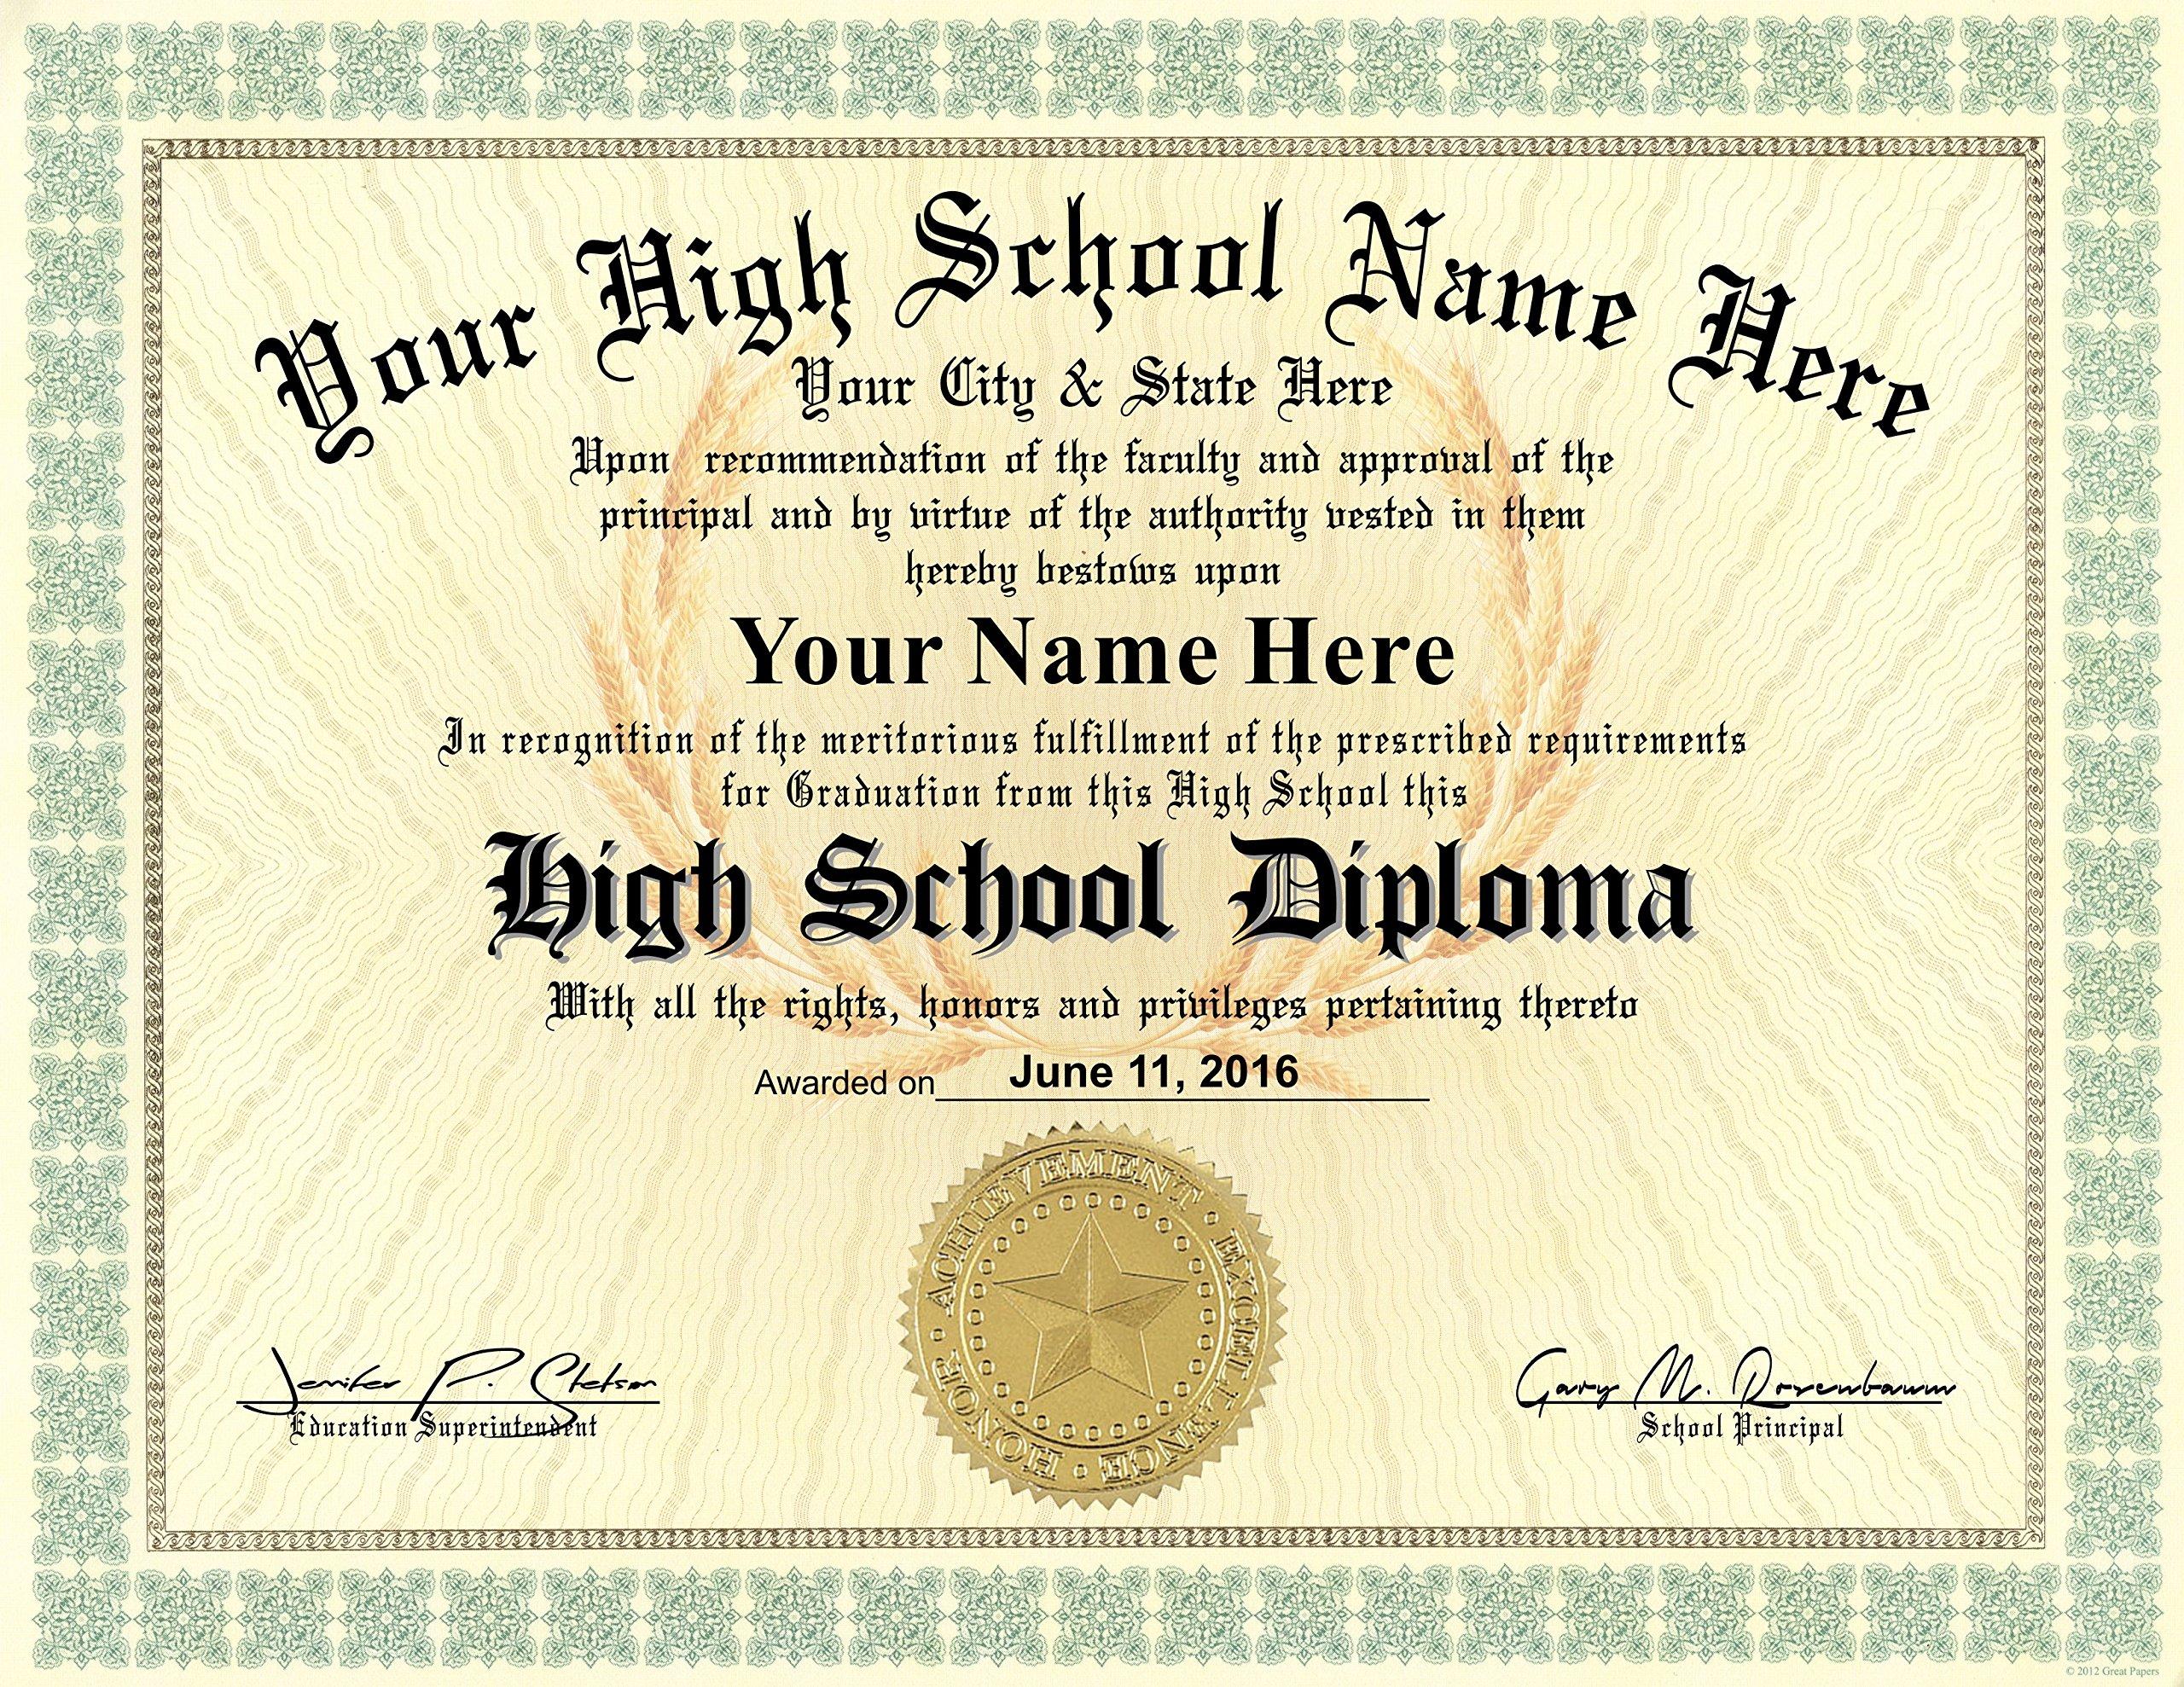 High School Diploma Custom Printed with Your Info - Premium Qaulity